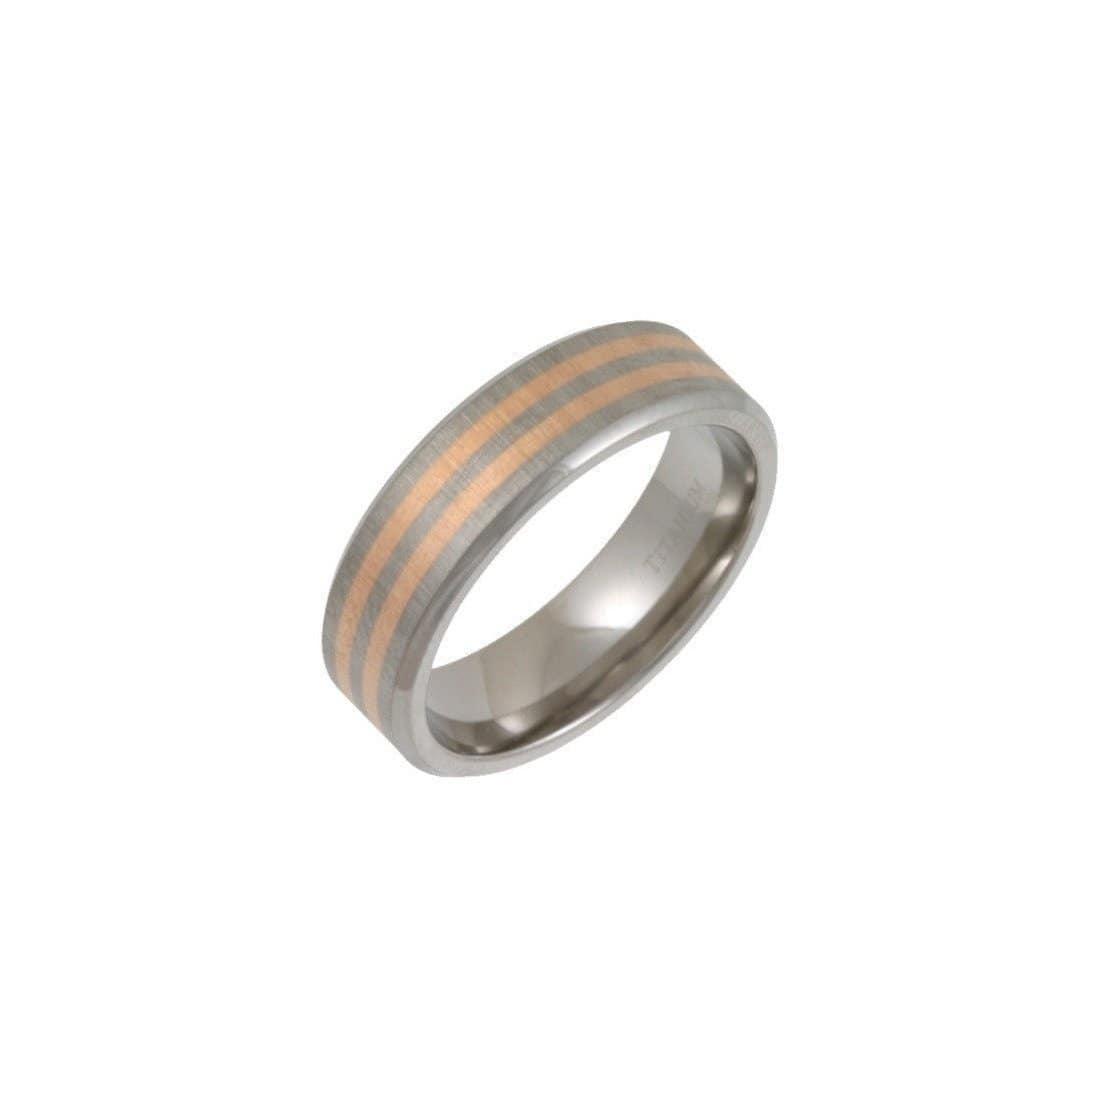 Titanium & Two 9kt Rose Gold Bands 7mm Flat Court-Shape Wedding Ring